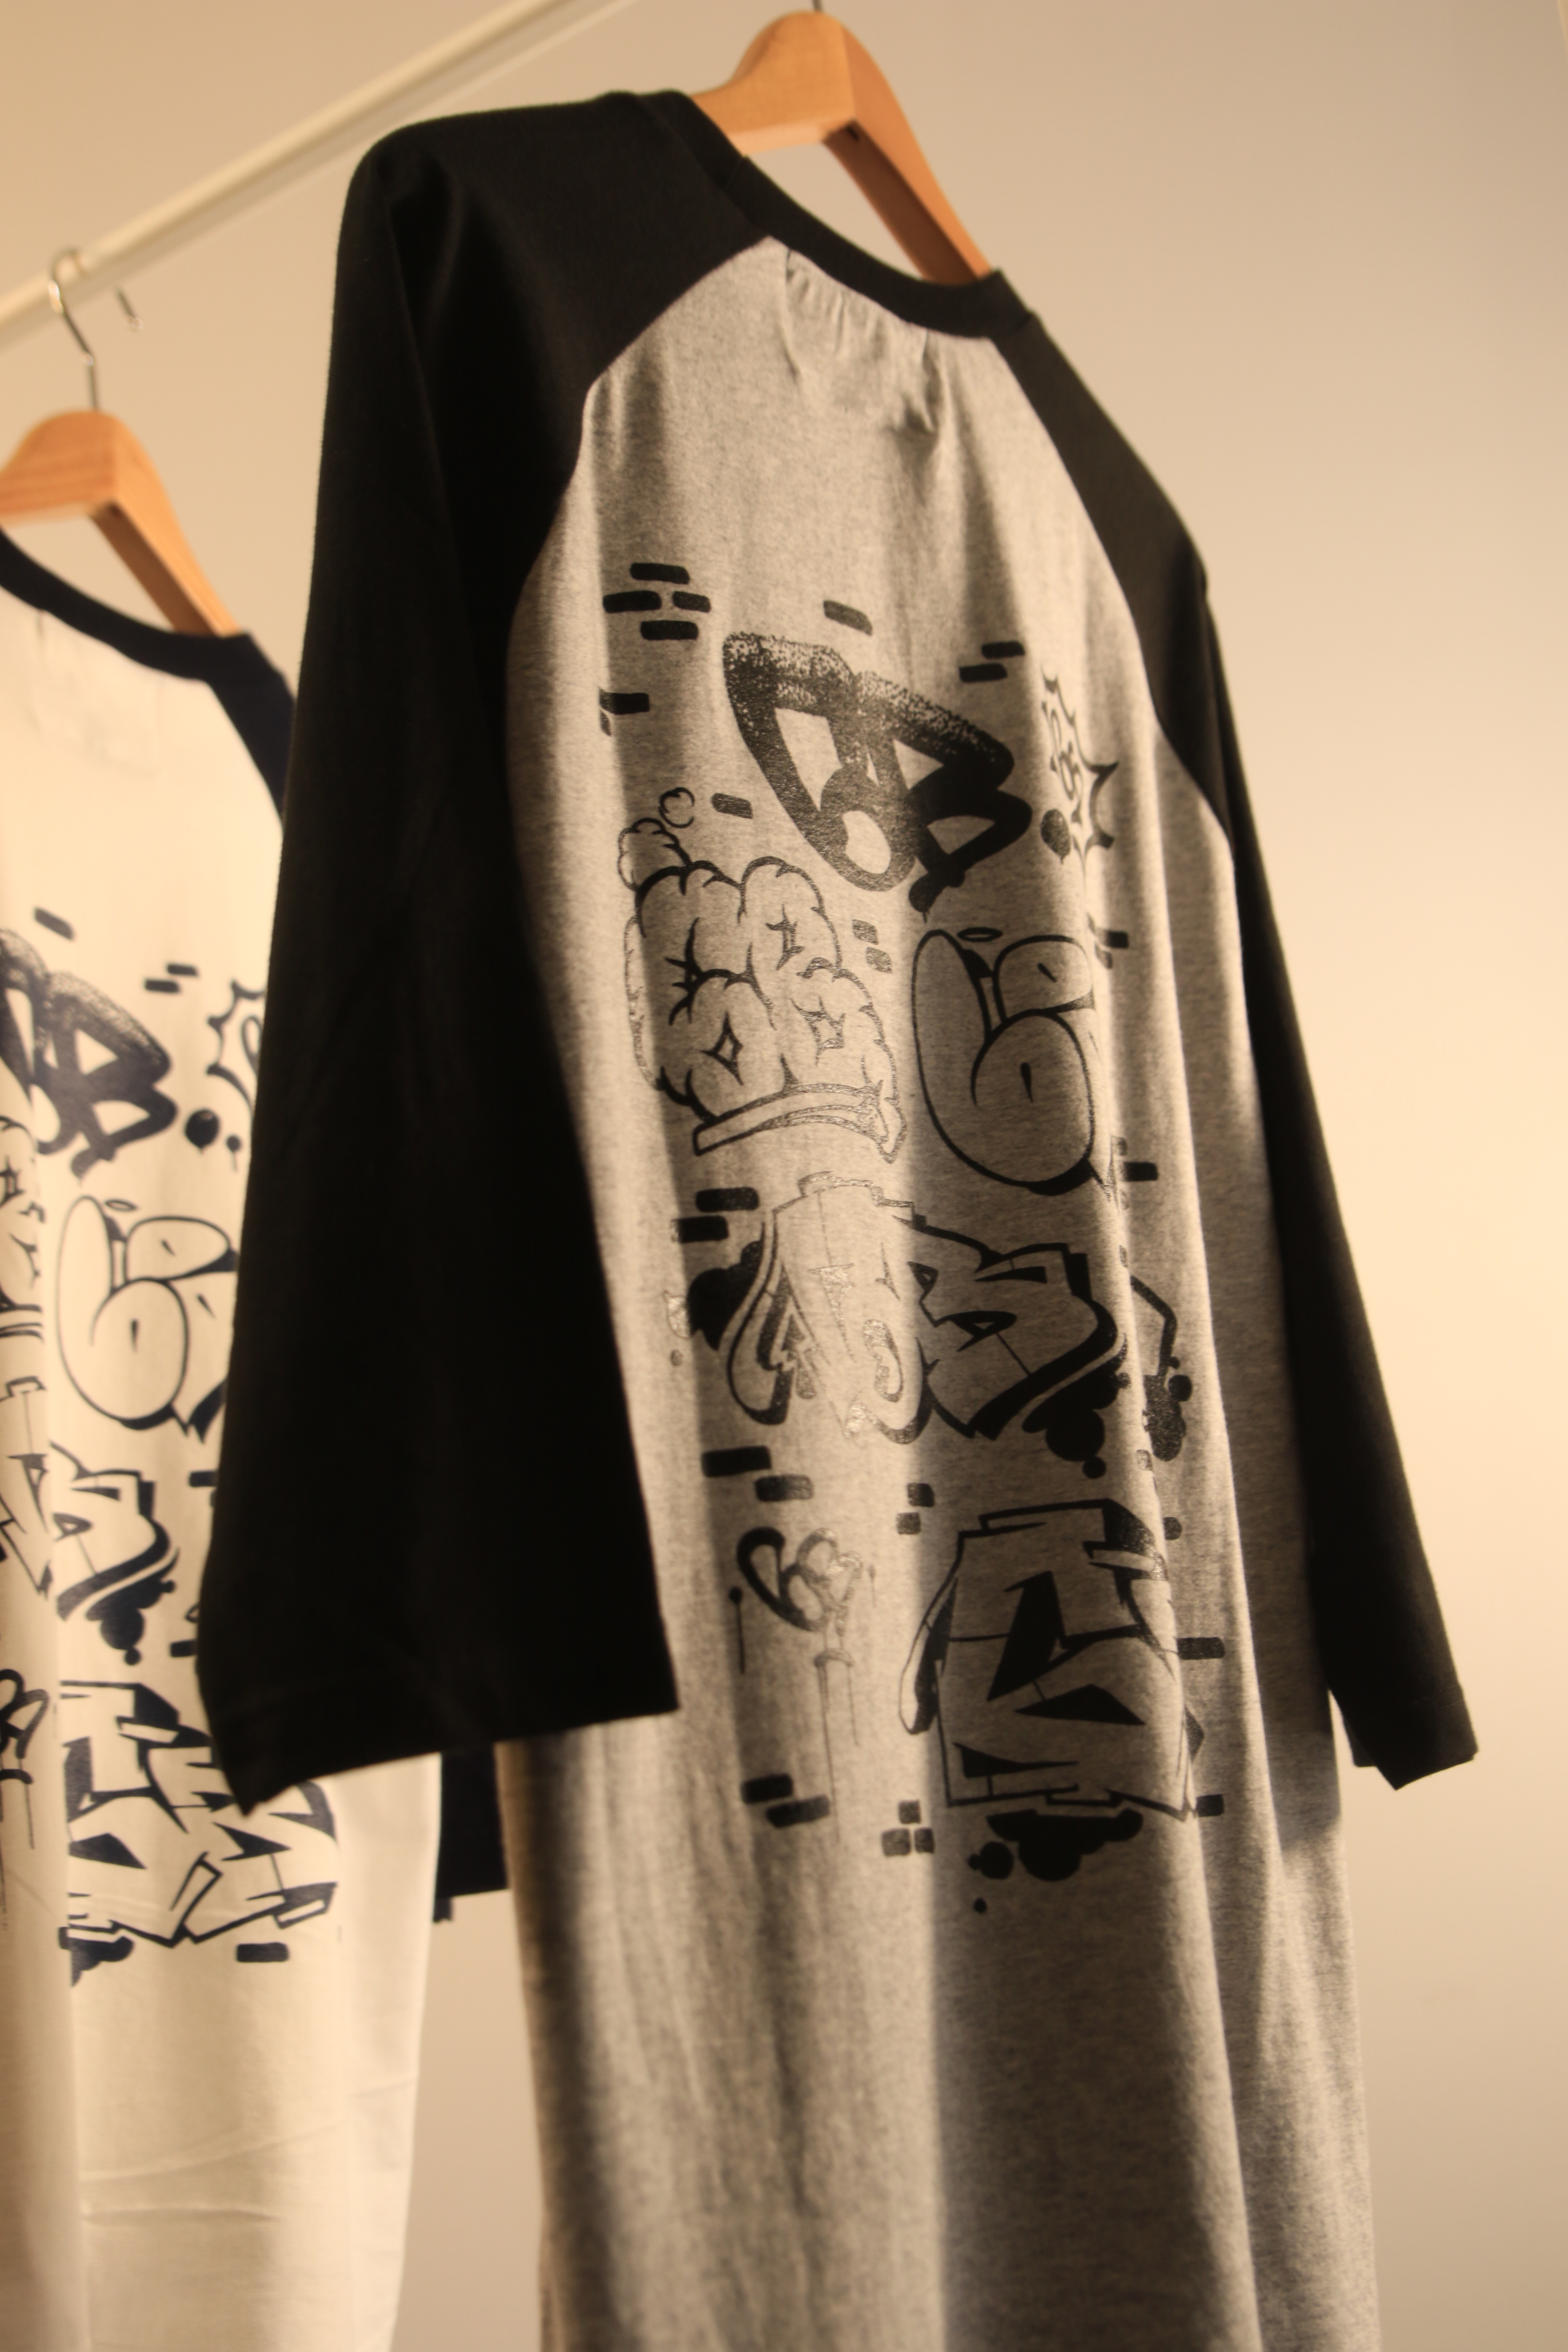 6th Wall by ATOMONE raglan 3/4 sleeve [ GRAY x BLACK ]